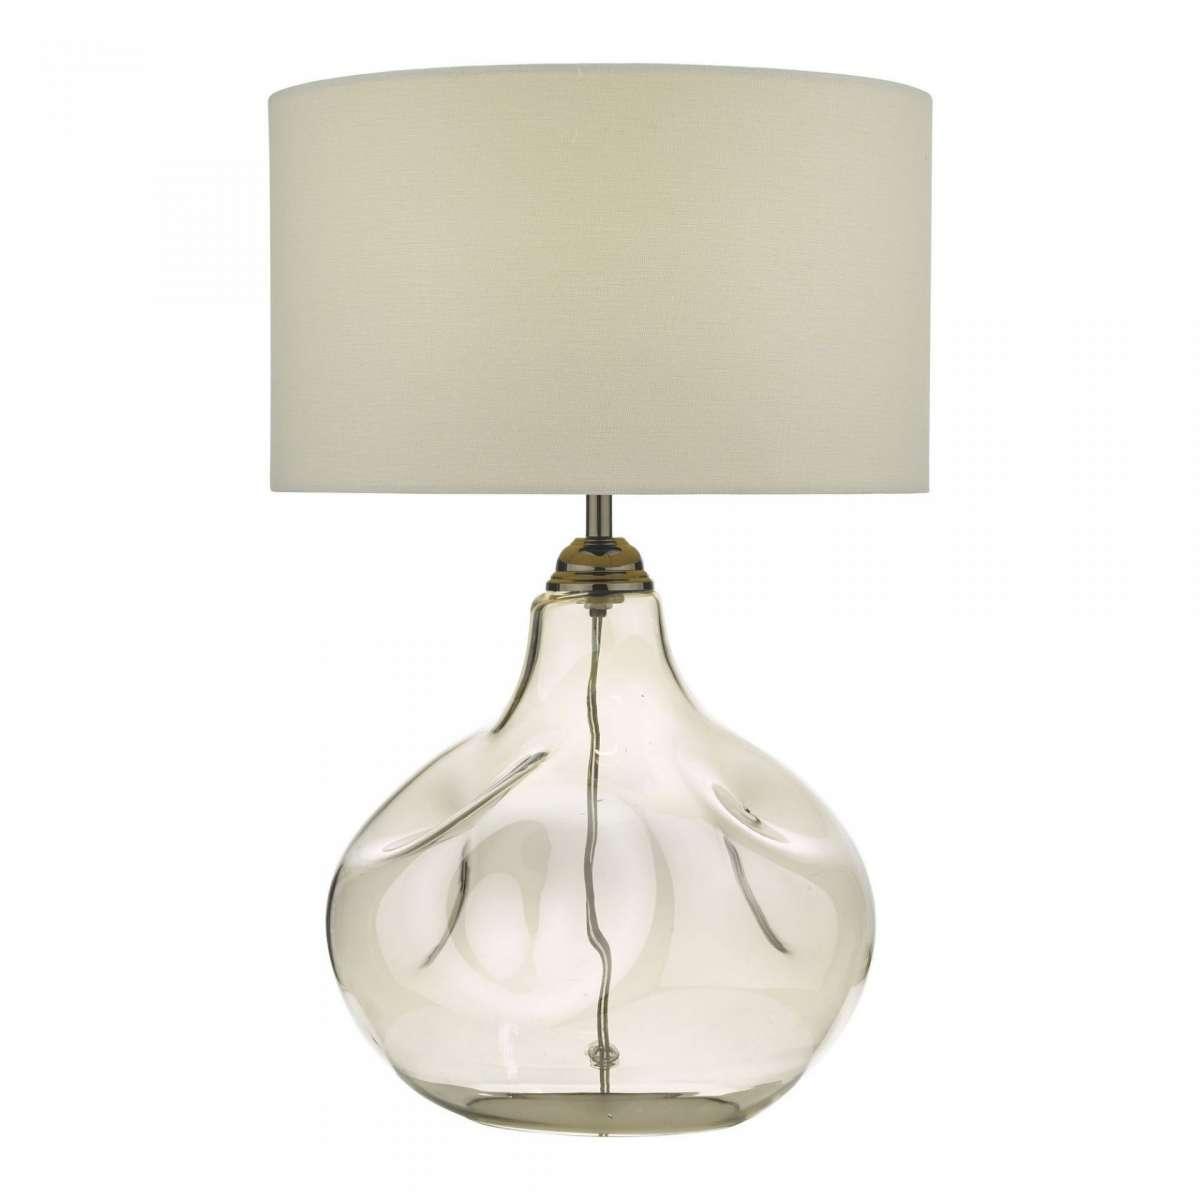 Esarosa Table Lamp Smoked Glass With Shade